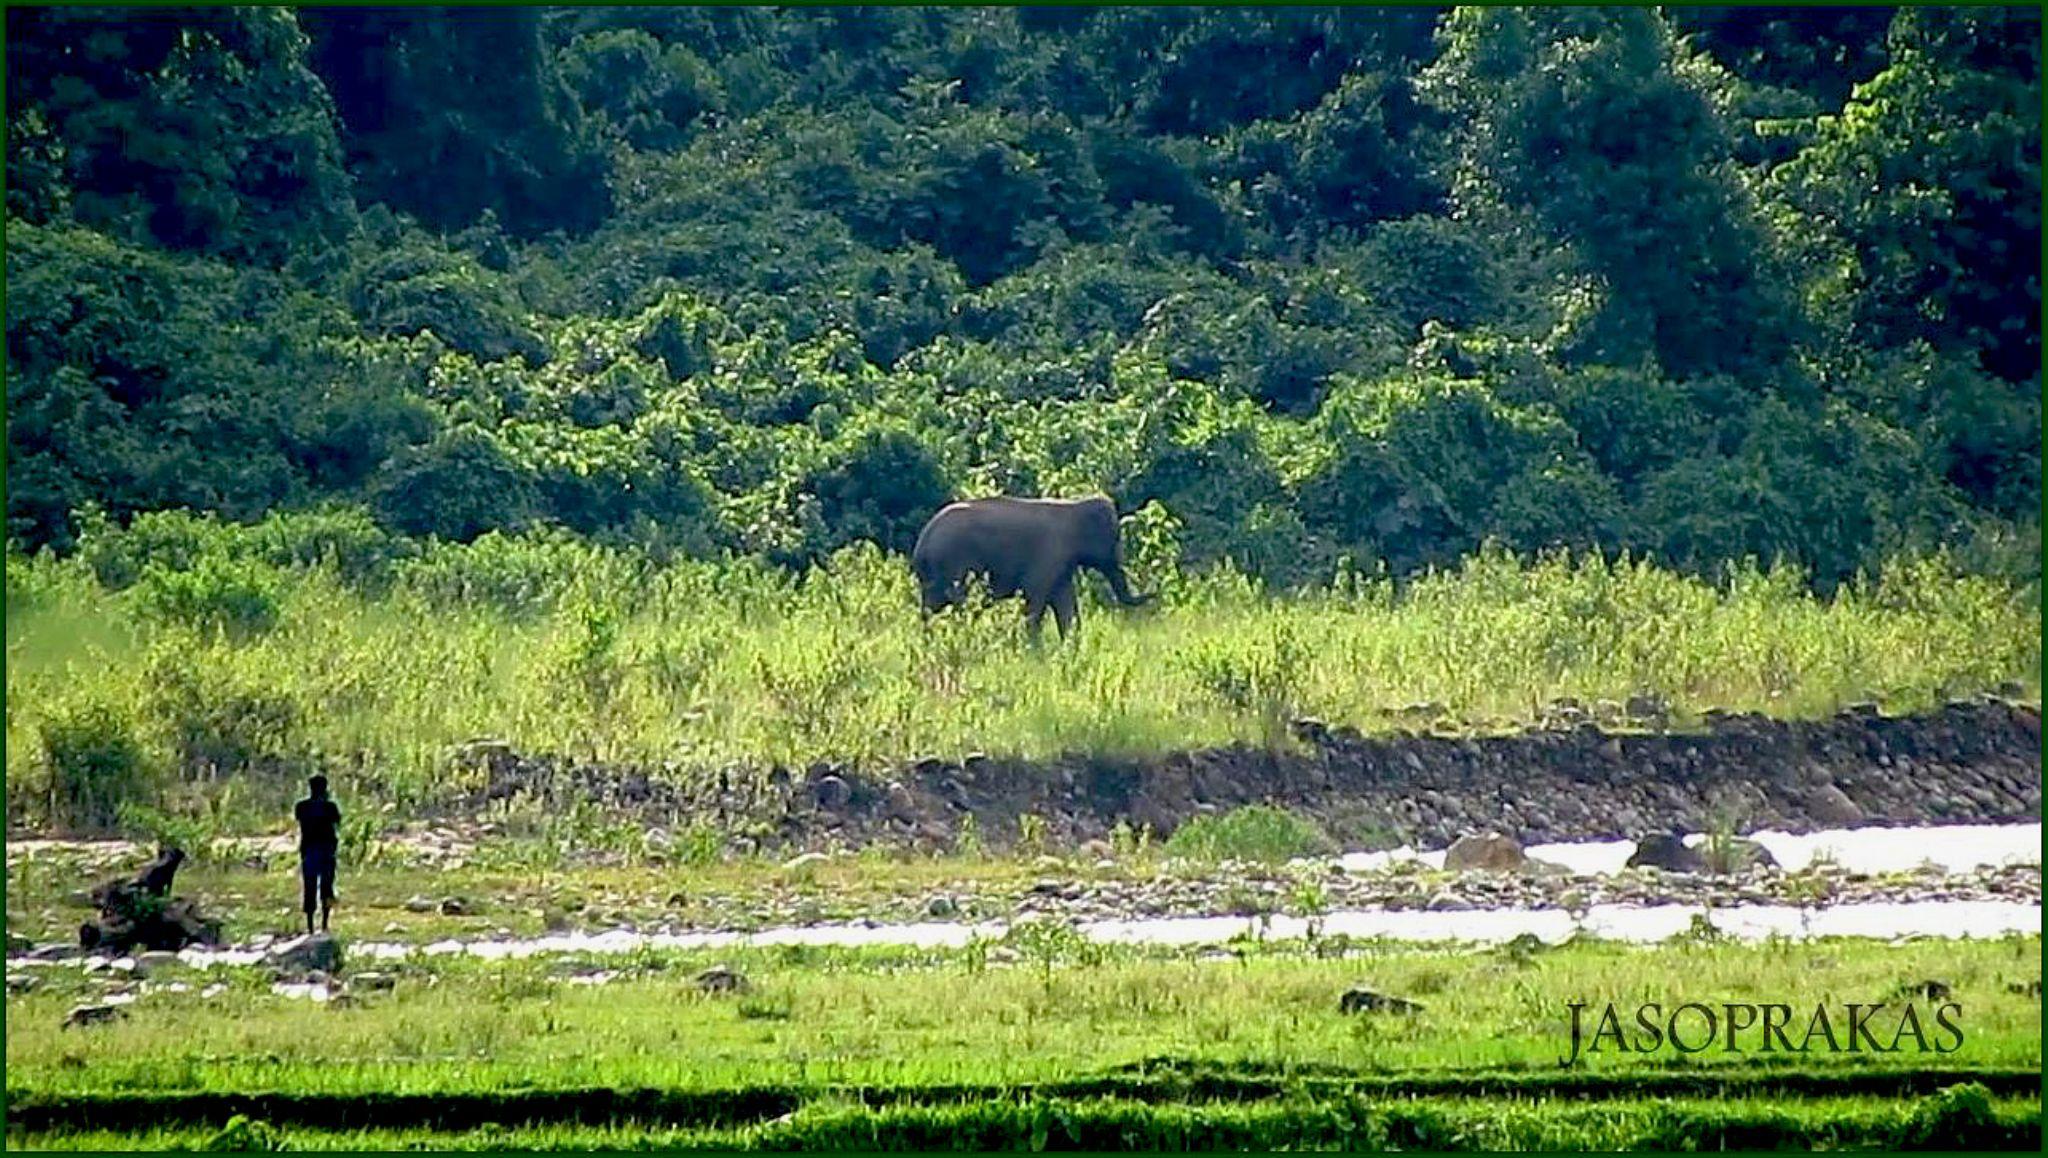 River Side Elephant by jasoprakas